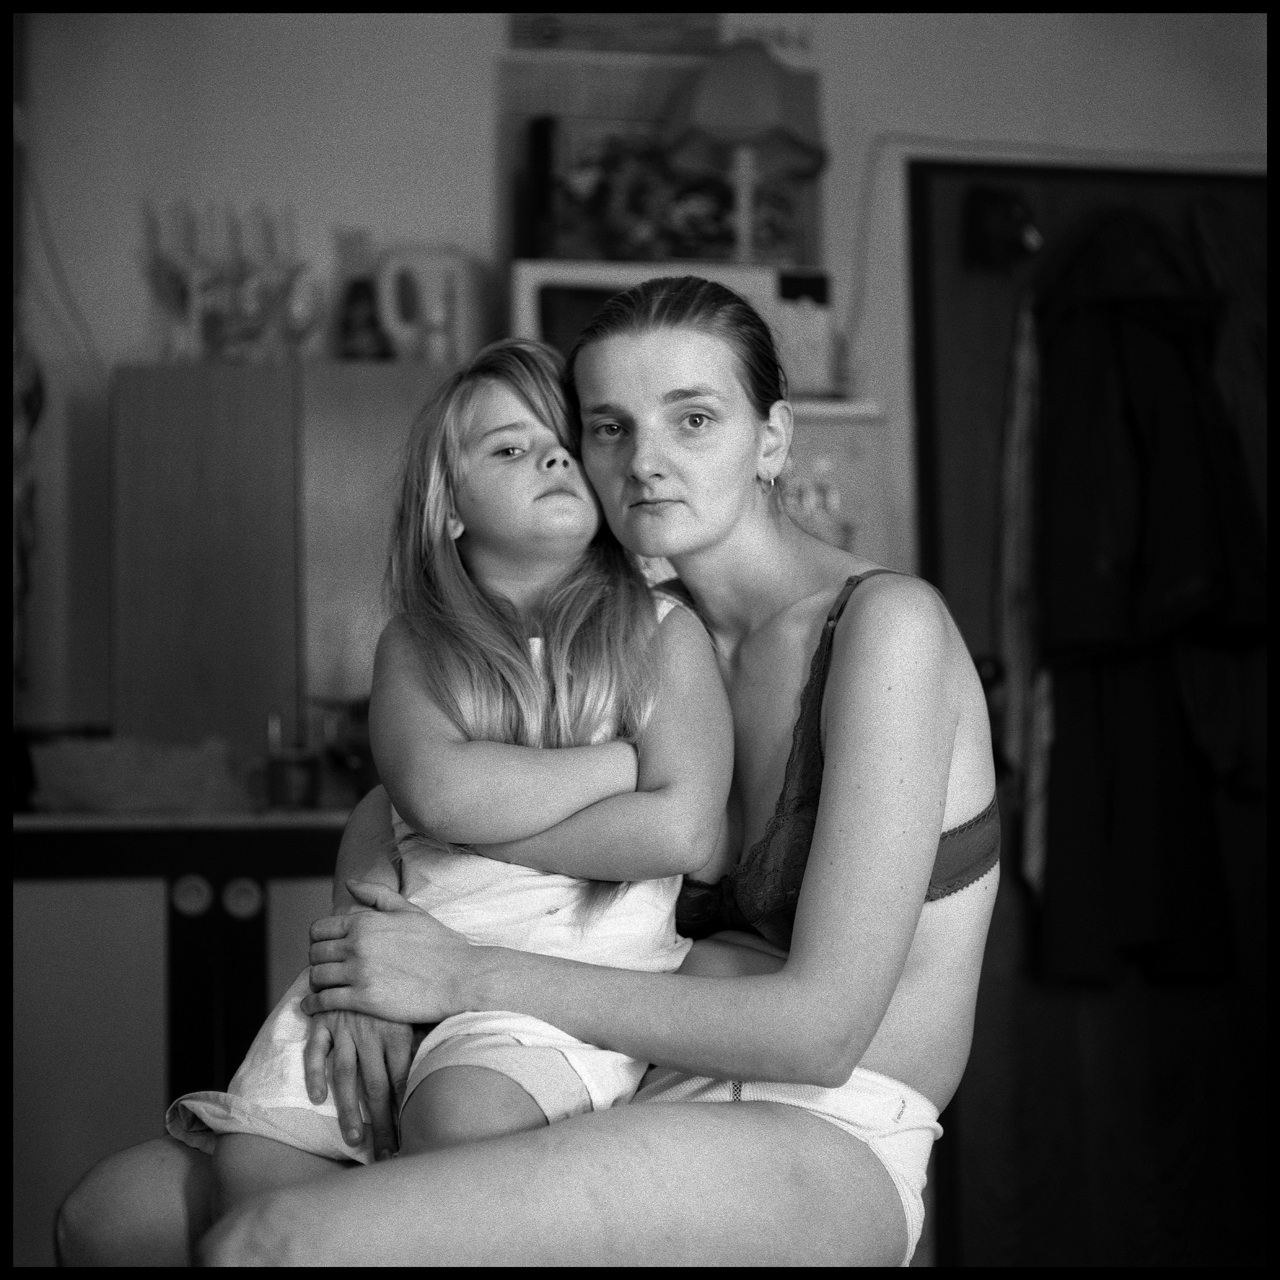 madres-ruido-photo-04-una-mama-novata